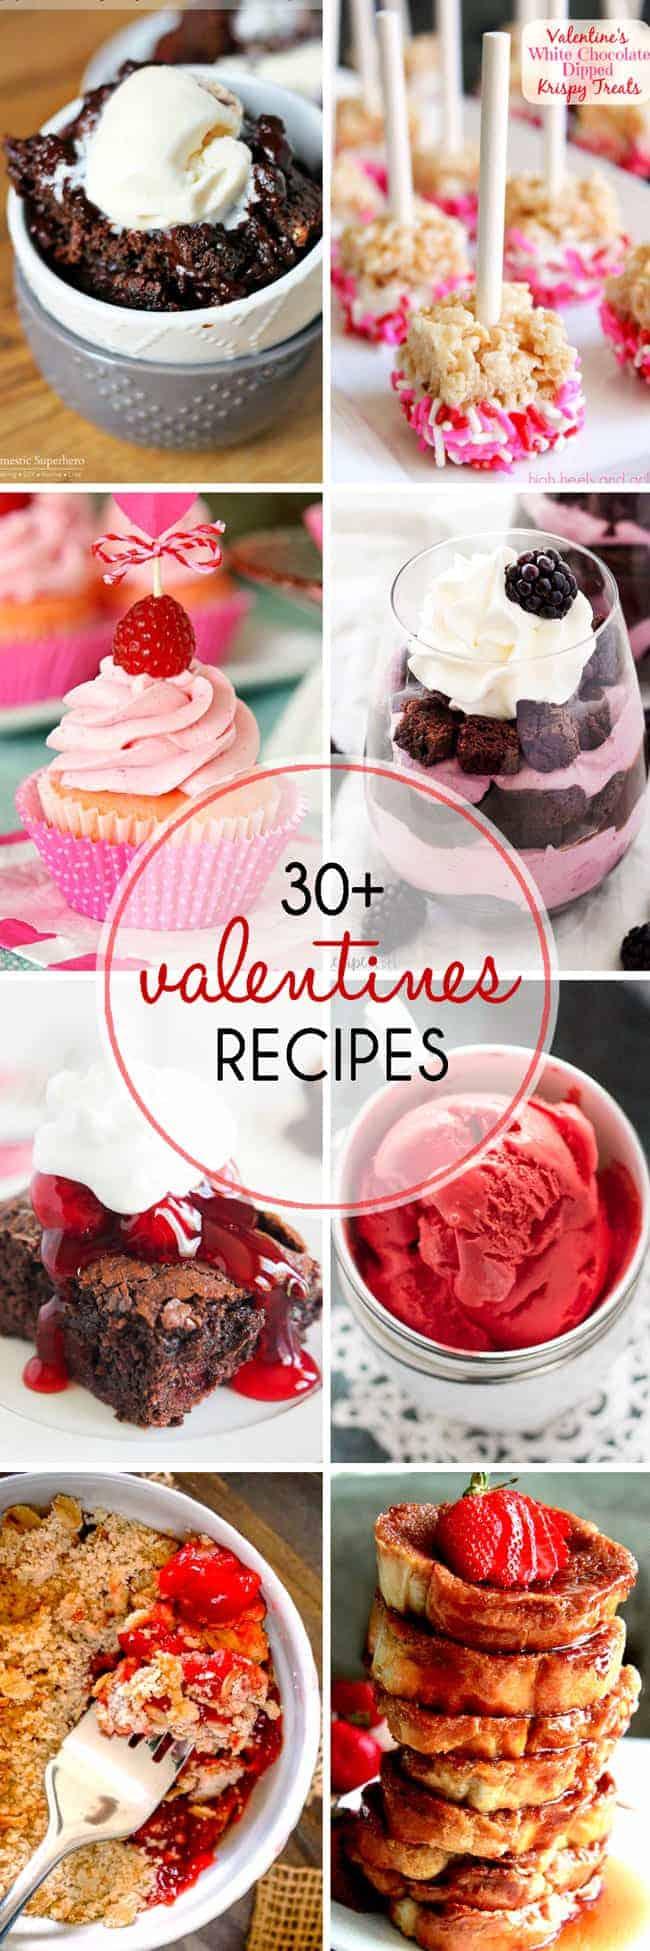 30+ Valentine's Day Recipes! Impress your Valentine with these easy and impressive Valentine's Day recipes!